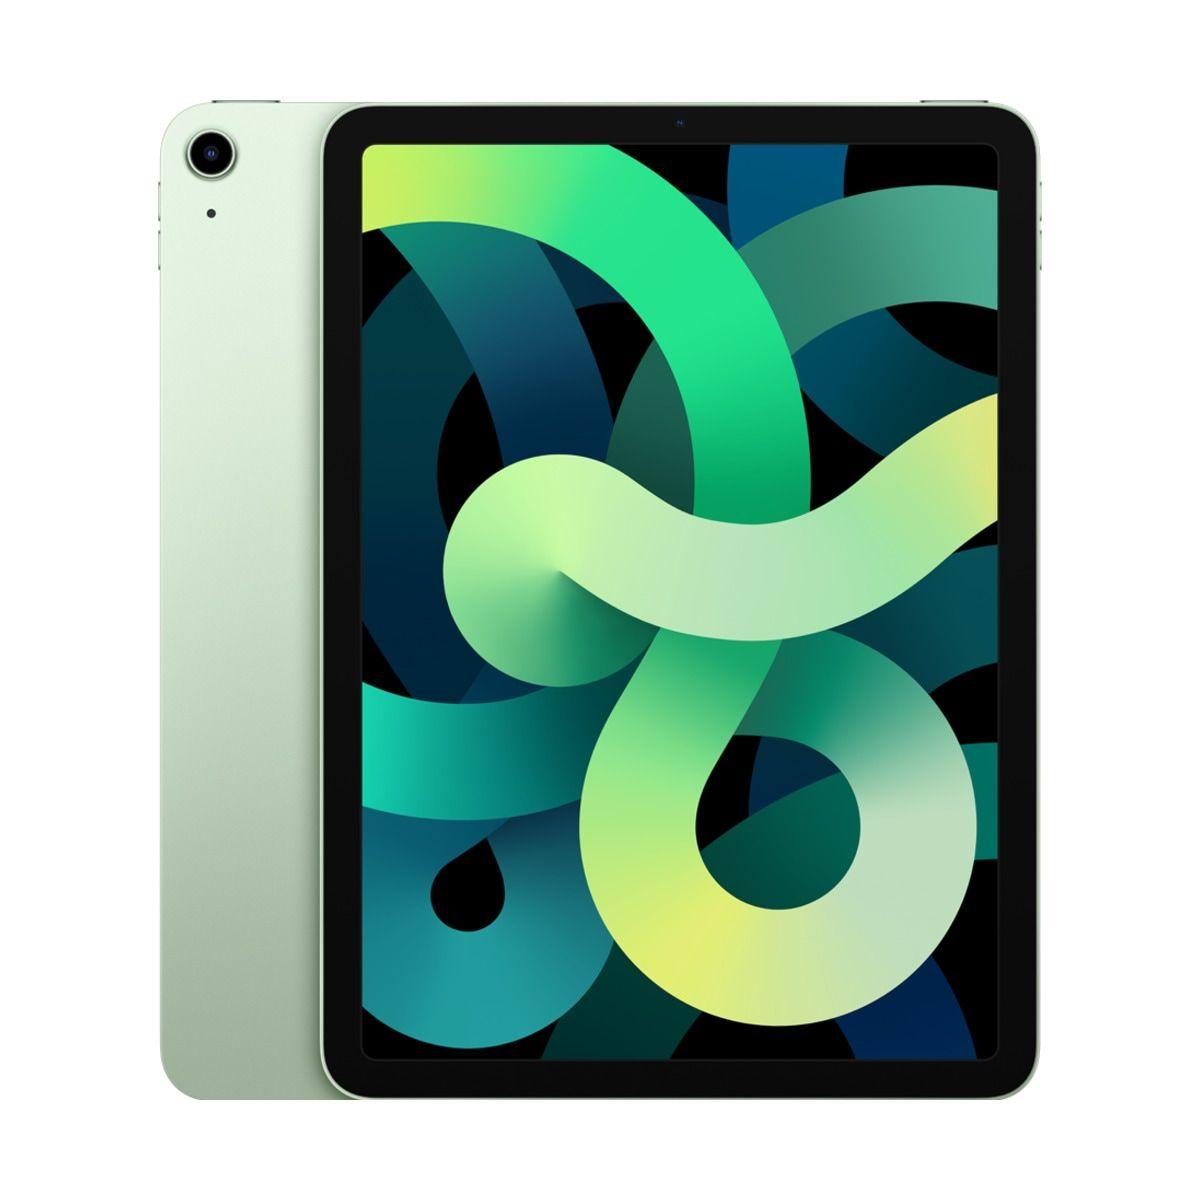 Apple iPad Air Wi-Fi 256GB - Green